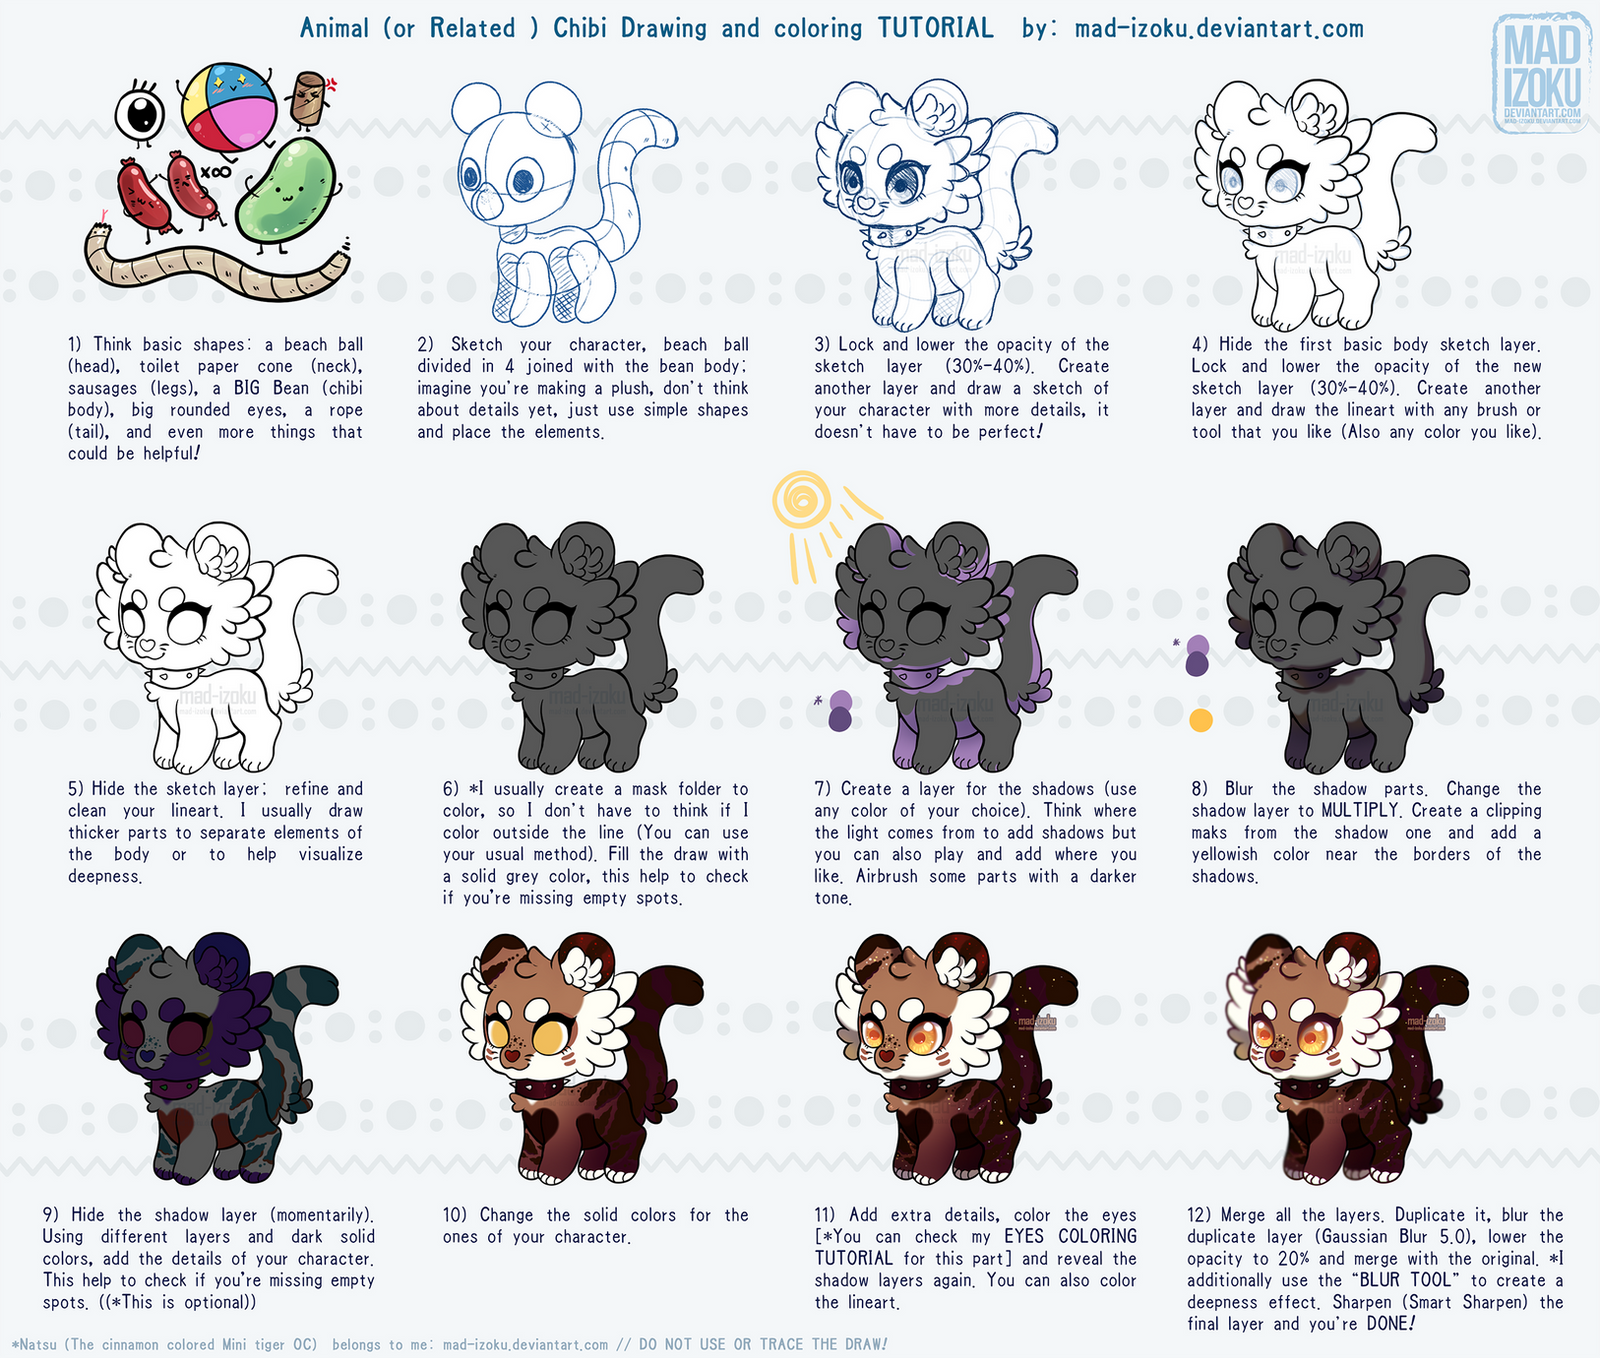 Animal Chibi Draw + Color TUTORIAL by Mad-Izoku by Mad-Izoku on ...